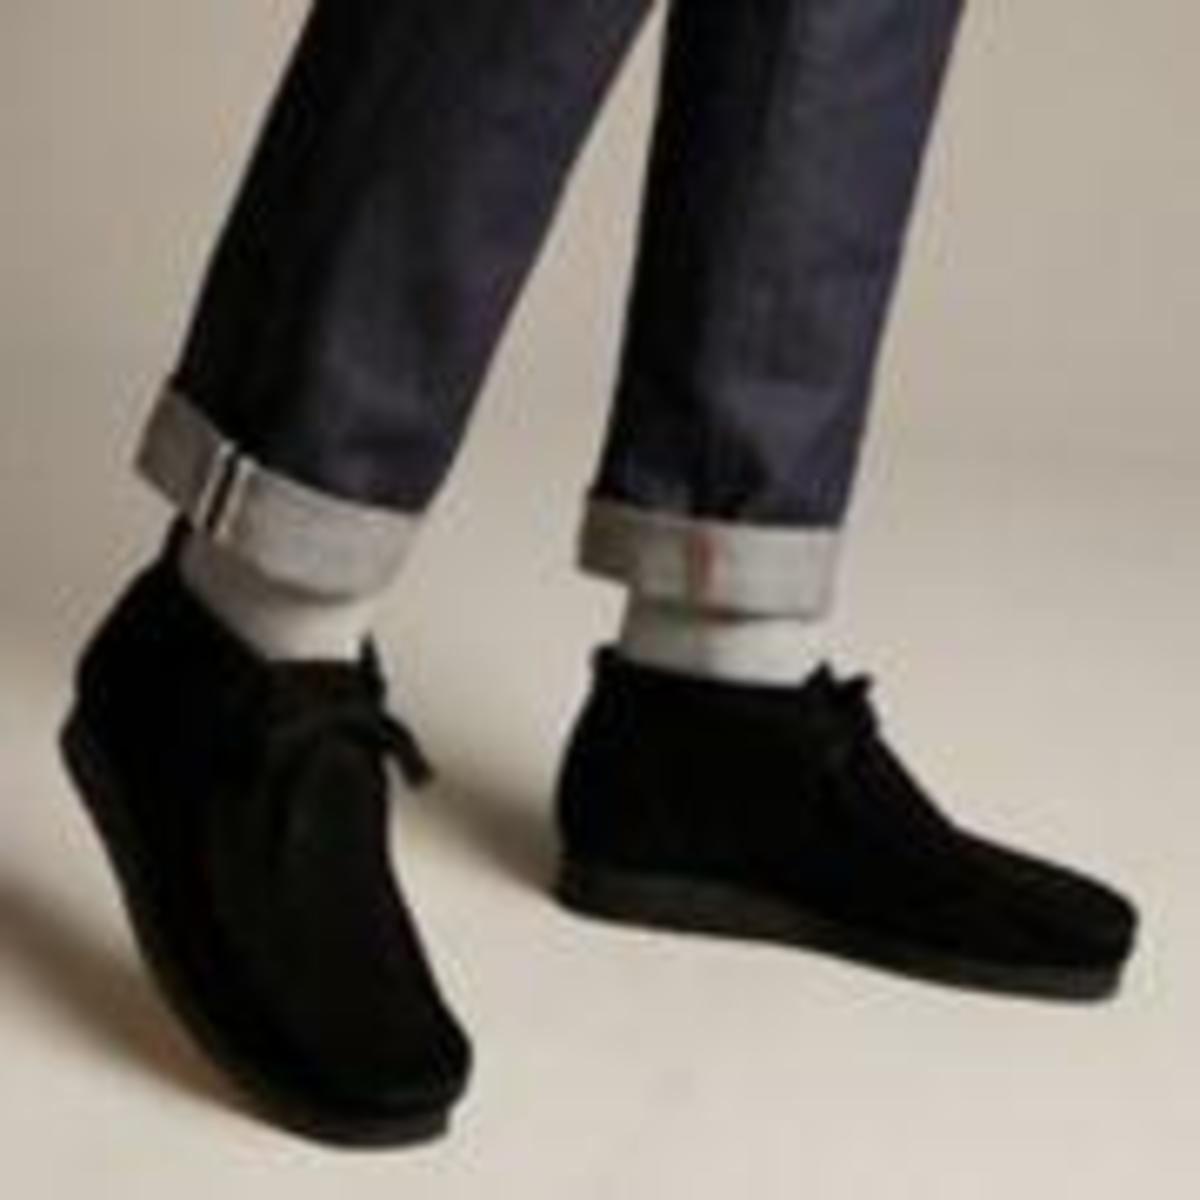 caldera gemelo objetivo  Clarks Wallabee Boot - Black Suede | Garmentory